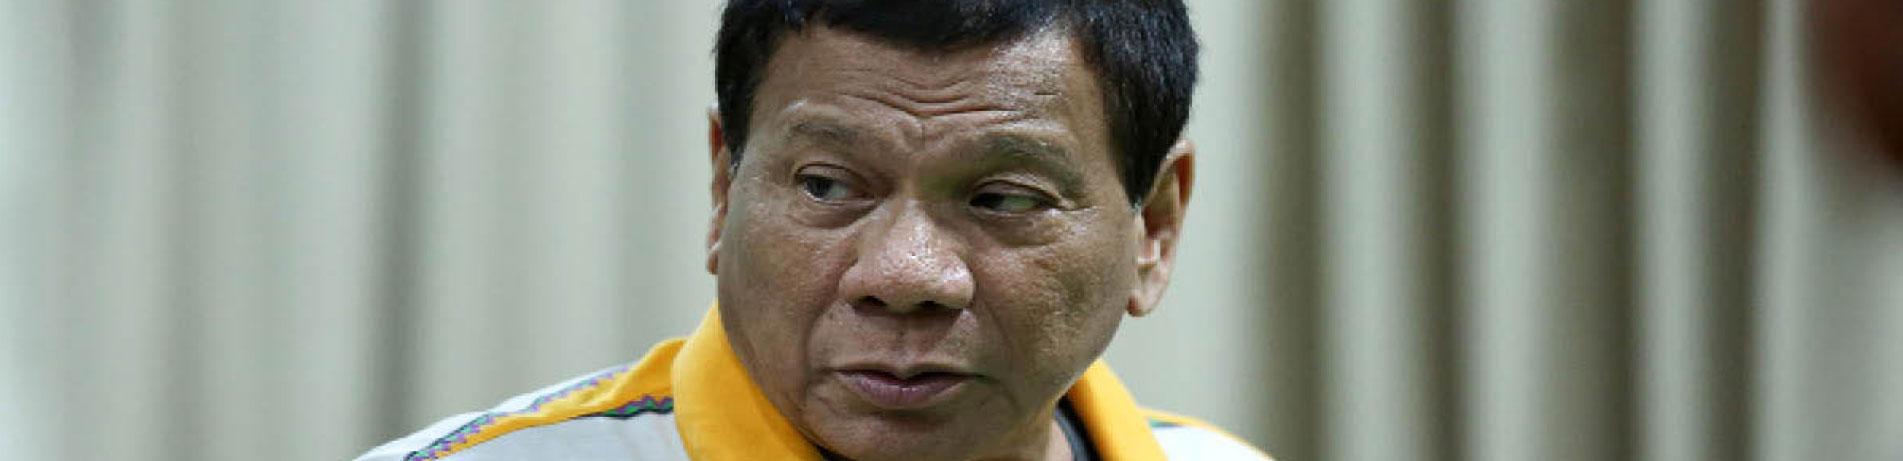 Philippines President Roberto Duterte